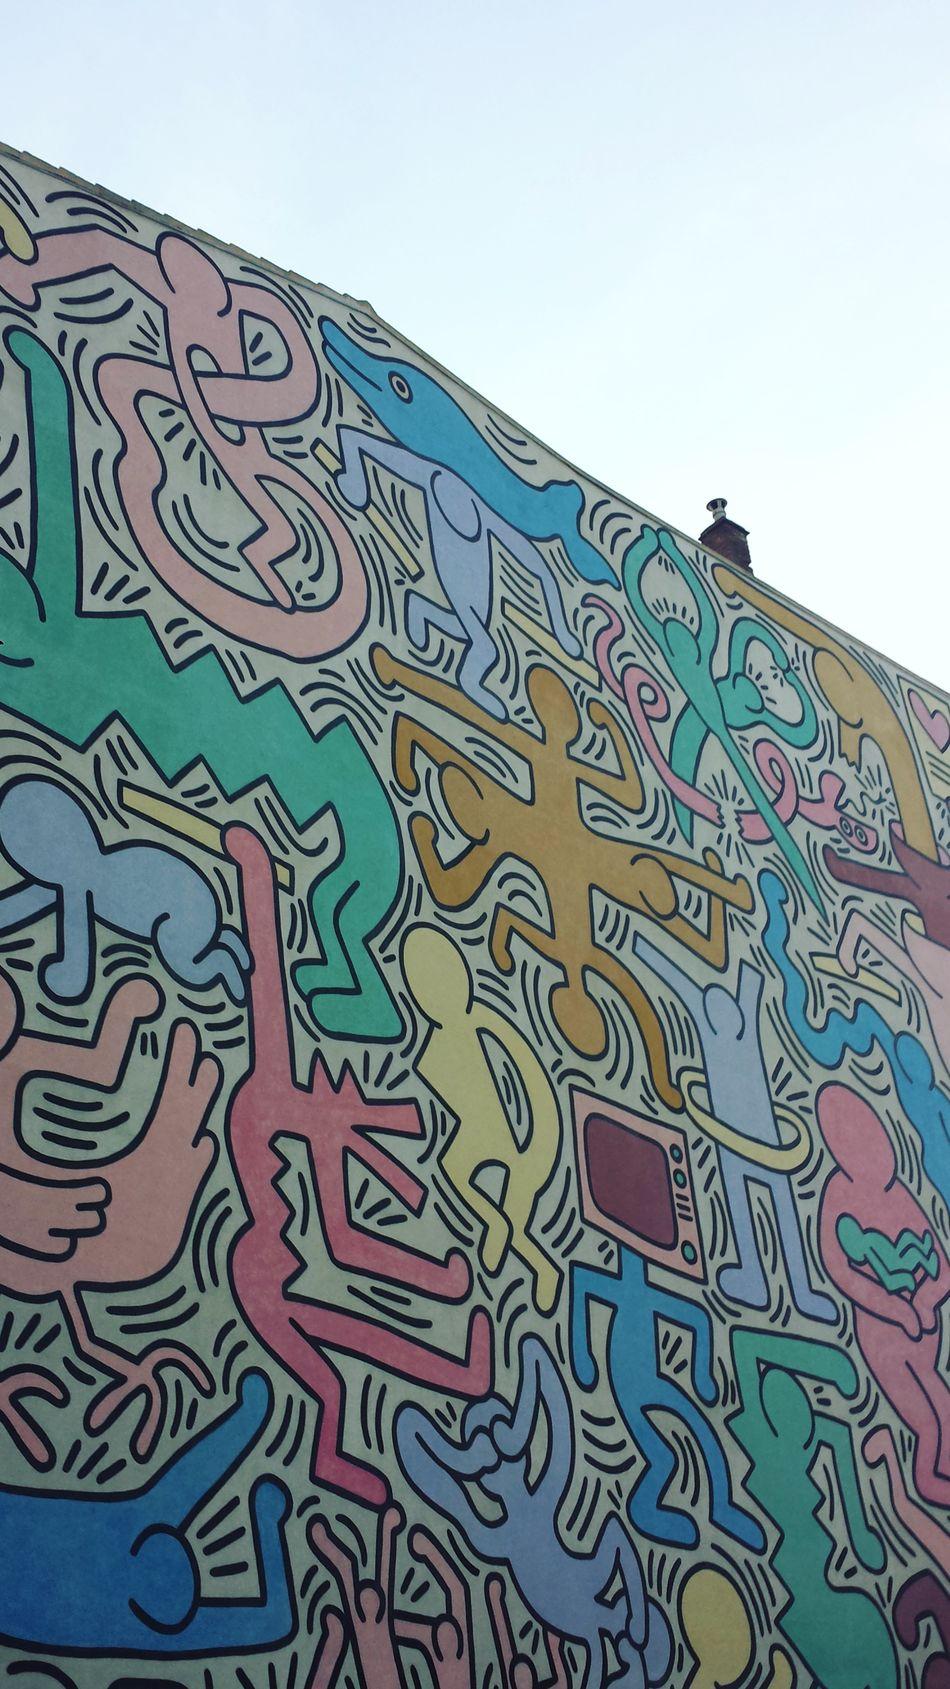 Architecture Art Artist Clear Sky Graffiti Graffiti & Streetart Graffiti Art Graffiti Wall Igers Igersitalia Igerspisa Igerstoscana Keith Haring Muralart Murales Muralesart Sky Tuttomondo